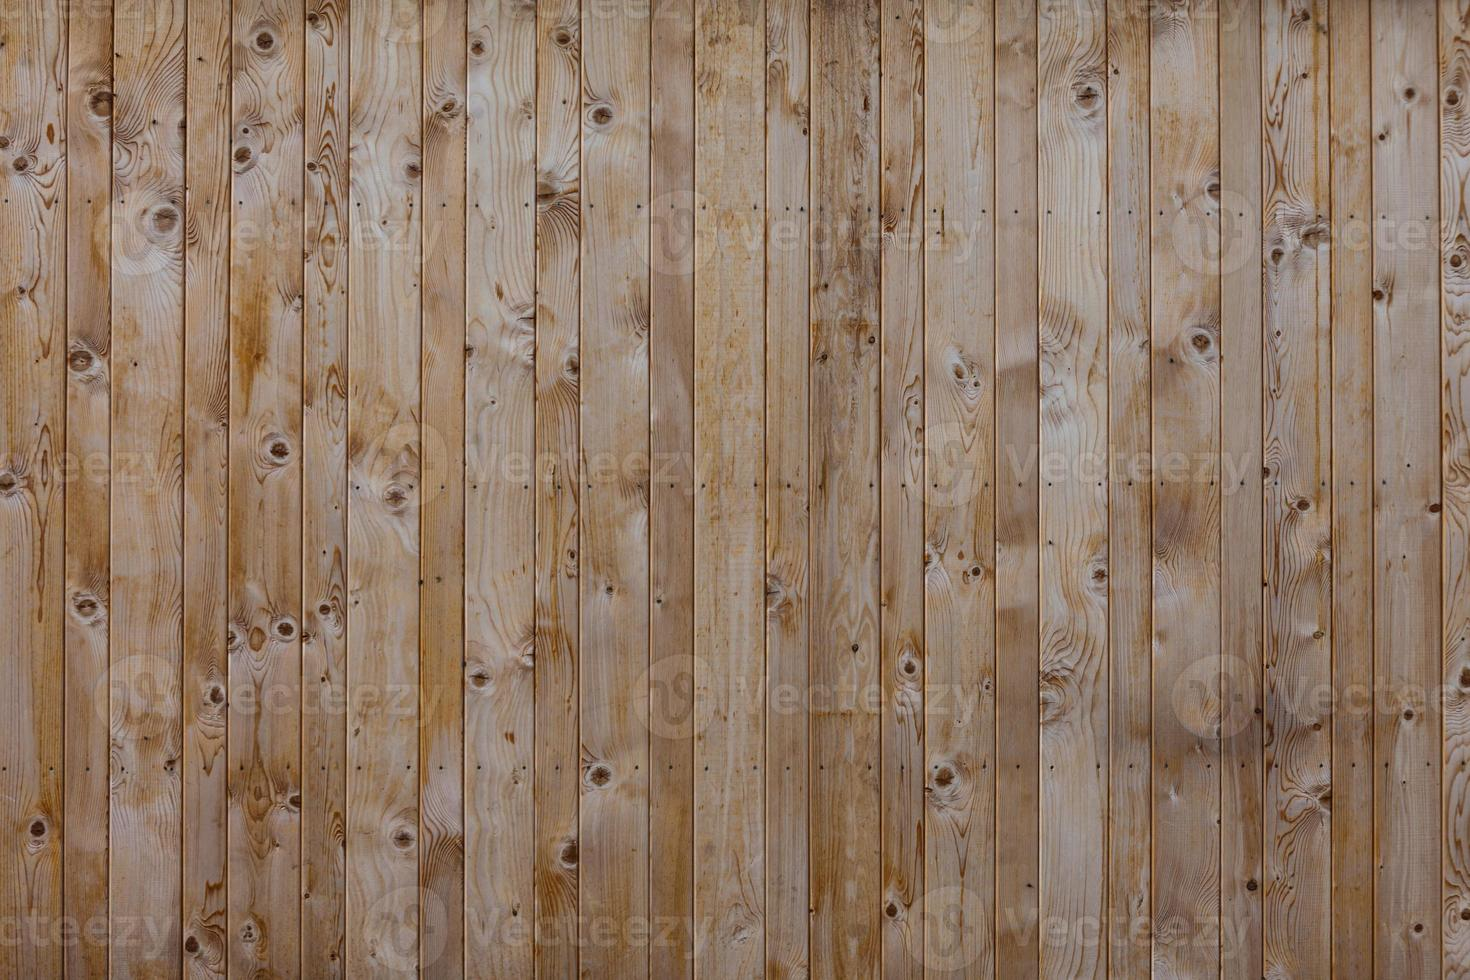 Holz - Textur foto